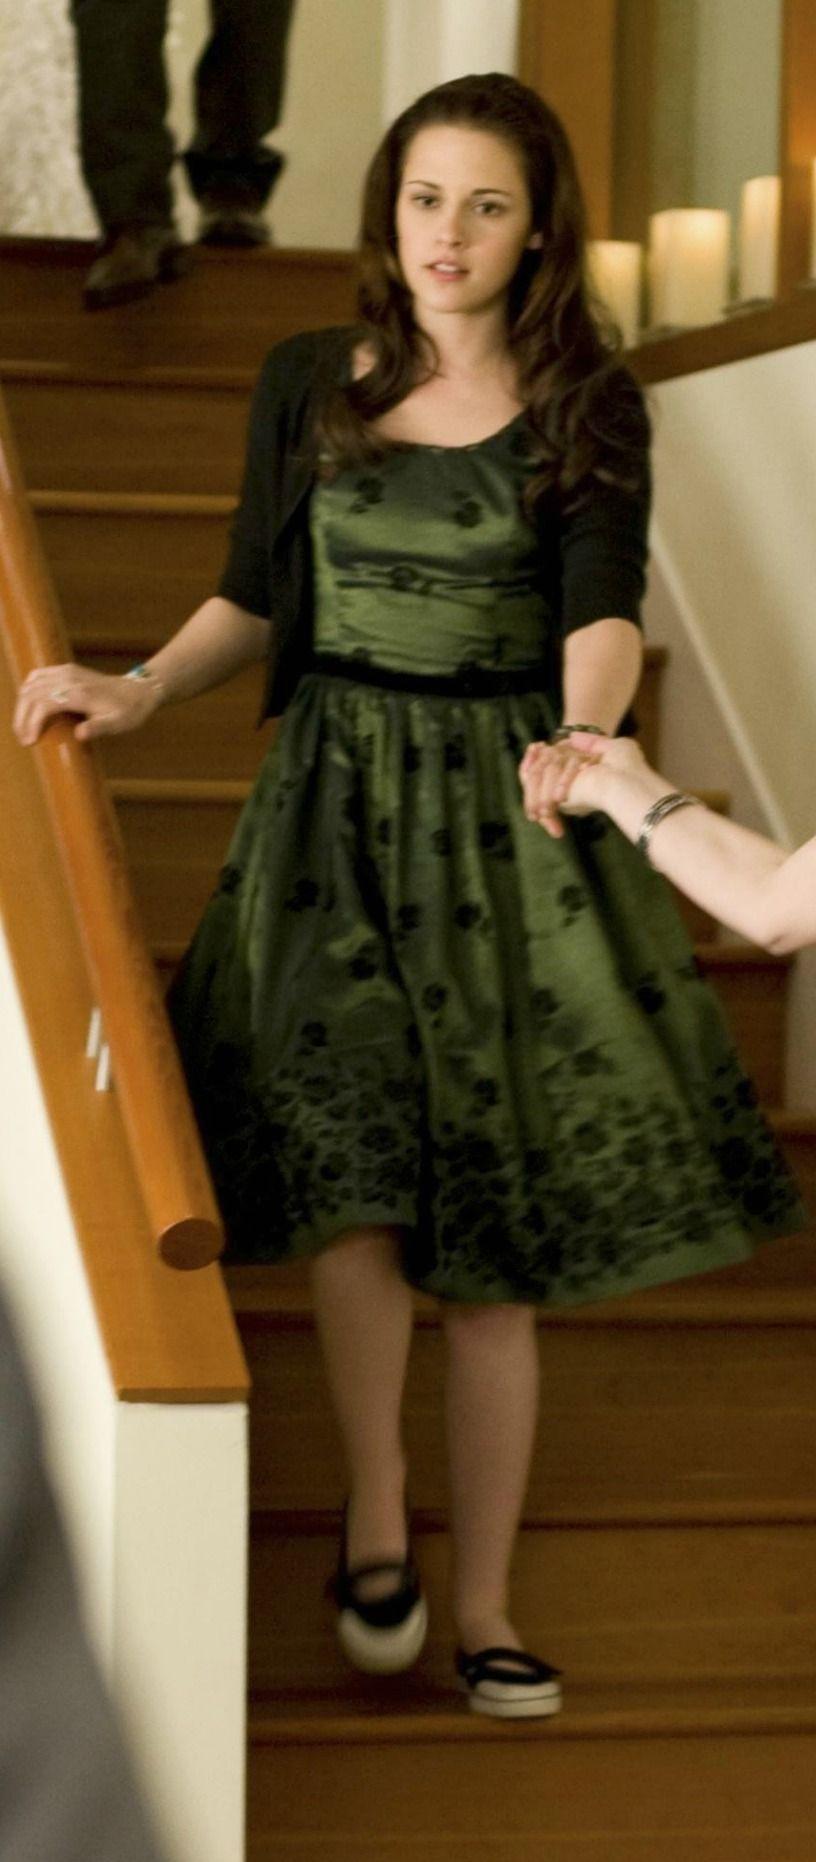 Bella Swan Green Taffeta Rose Embellished Birthday Dress In The Twilight Saga New Moon Dresses Twilight Outfits Dress Twilight [ 1862 x 816 Pixel ]